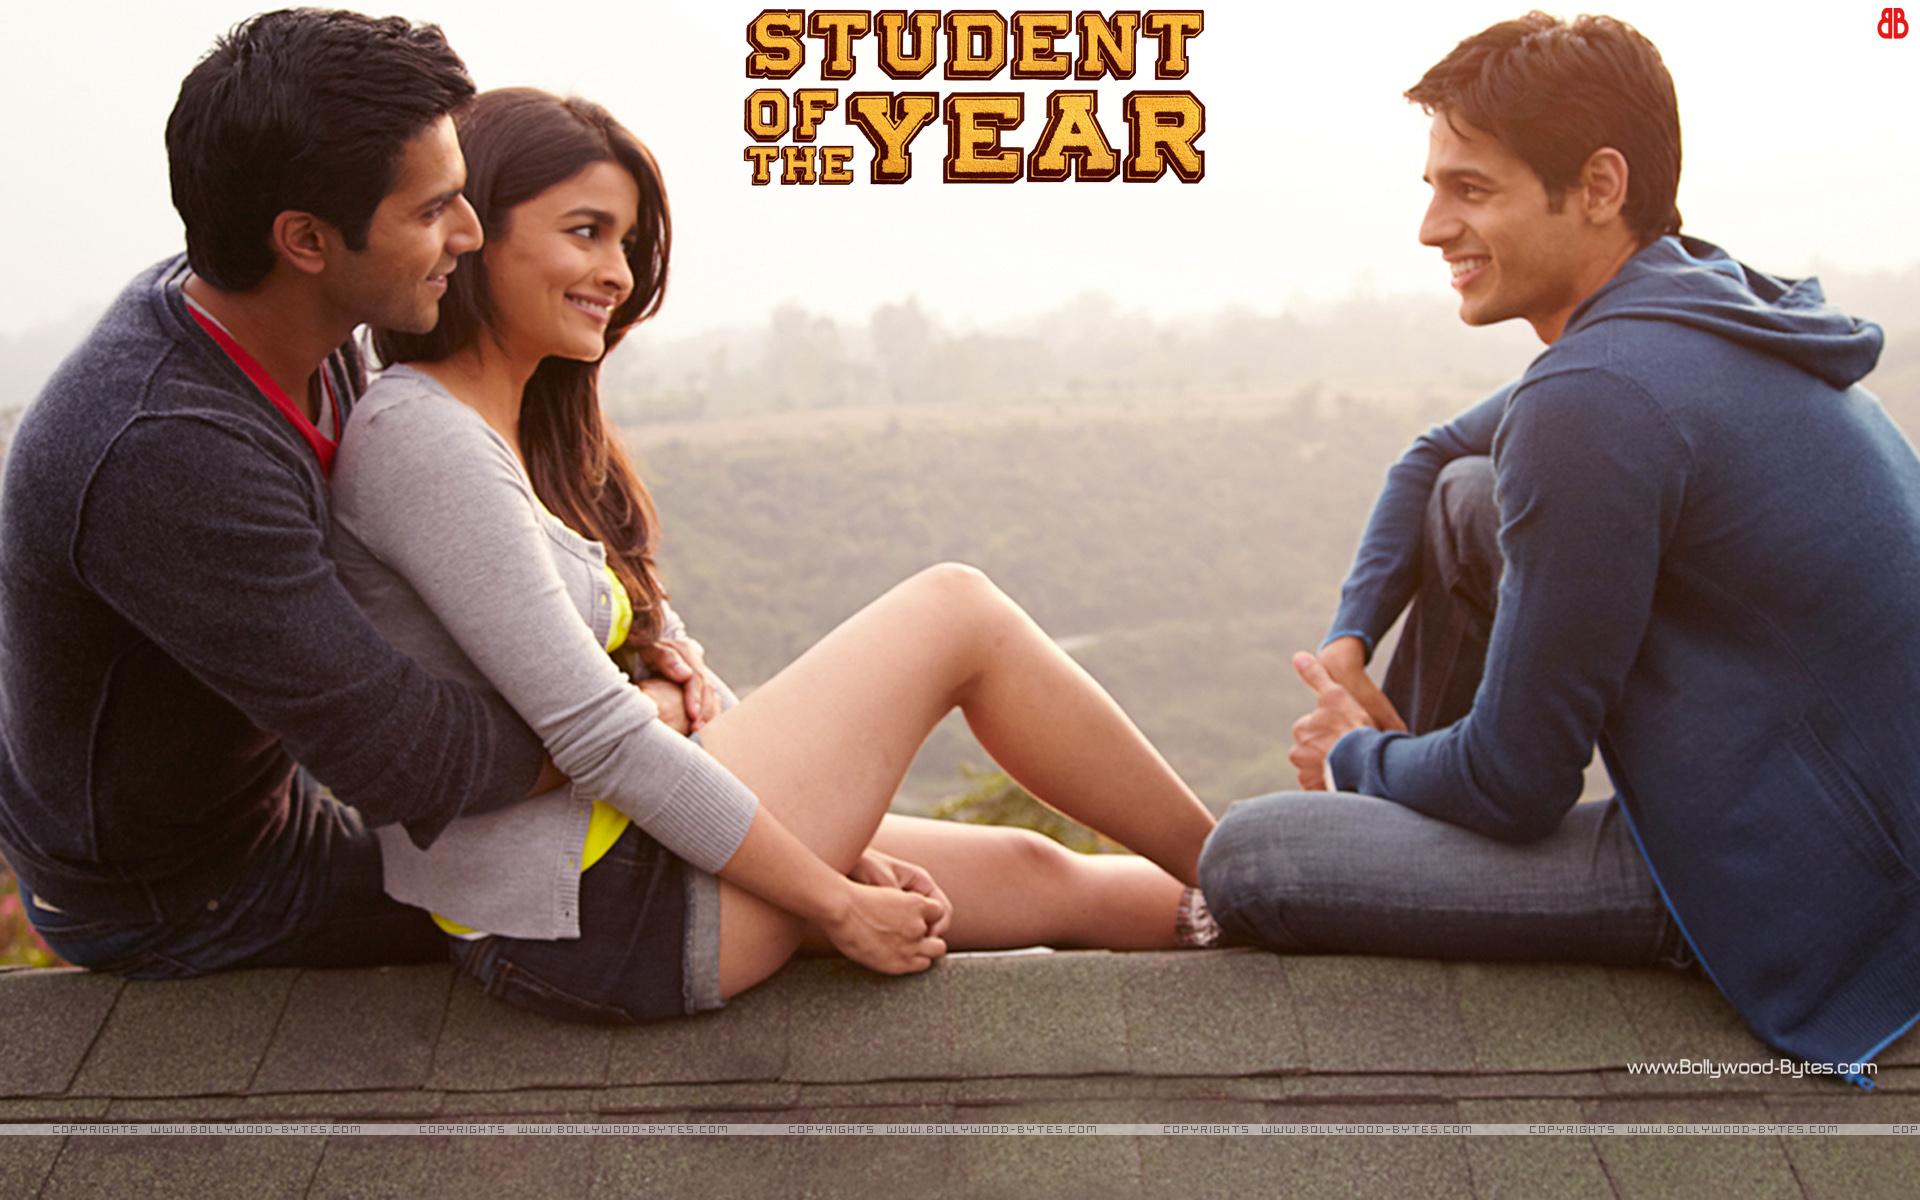 http://3.bp.blogspot.com/-fbO6YZovz-Q/UFd__iSO4HI/AAAAAAAAPLY/-U9X2fSuCwc/s1920/Student-Of-The-Year-+Hot-Alia-Bhatt-Varun-Dhawan-Sidharth-Malhotra-HD-Wallaper-16.jpg